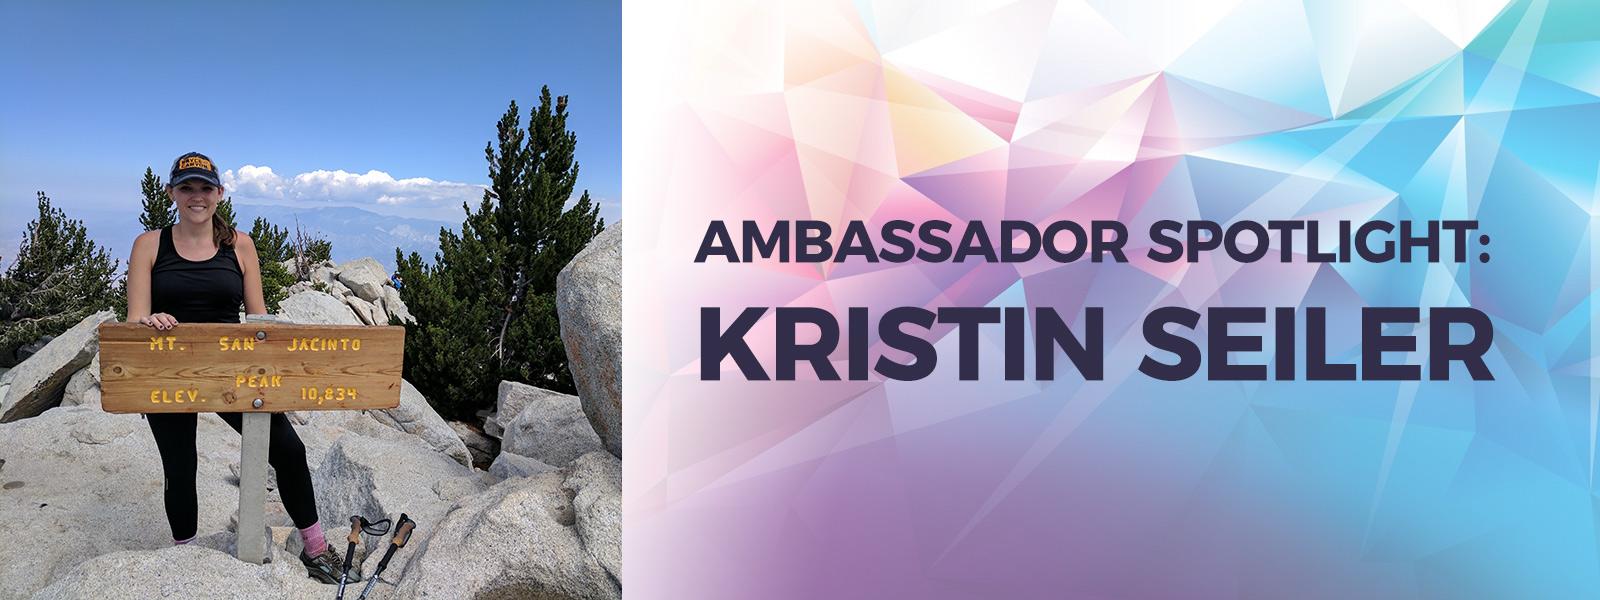 Ambassador Spotlight - Kristin Seiler